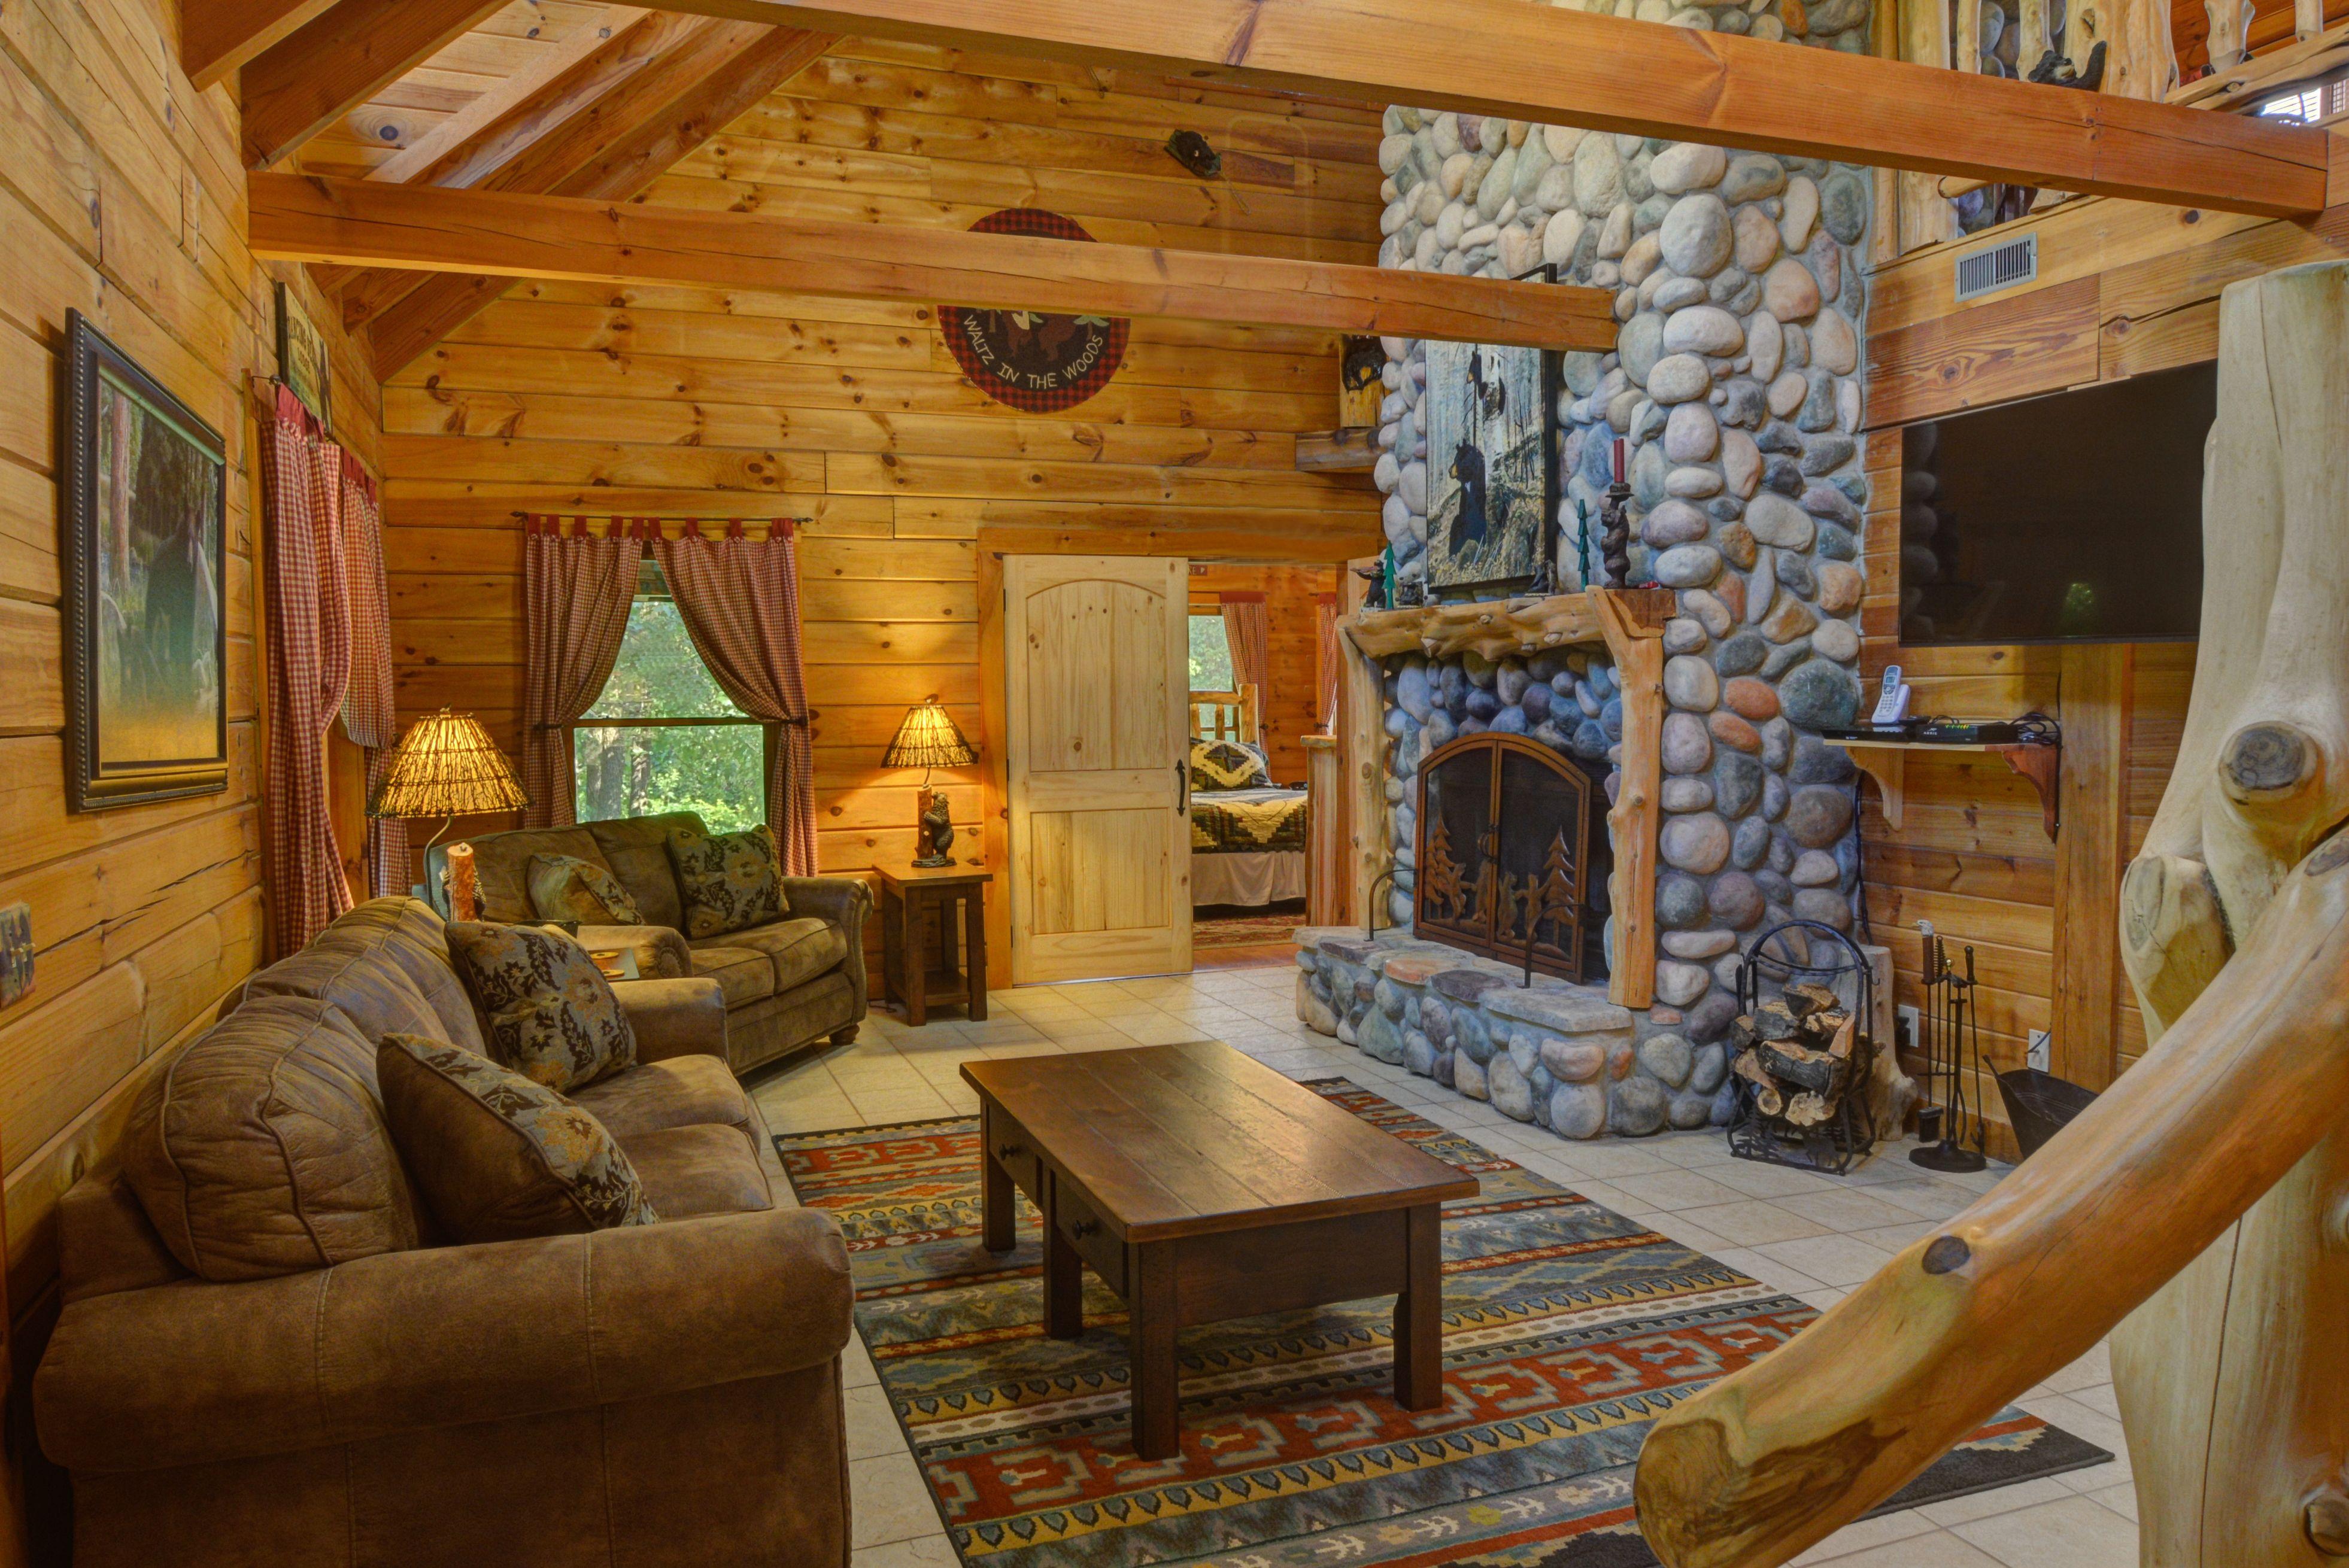 Dancing Bear Lodge - 4 bed / 2-1/2 bath log cabin: living